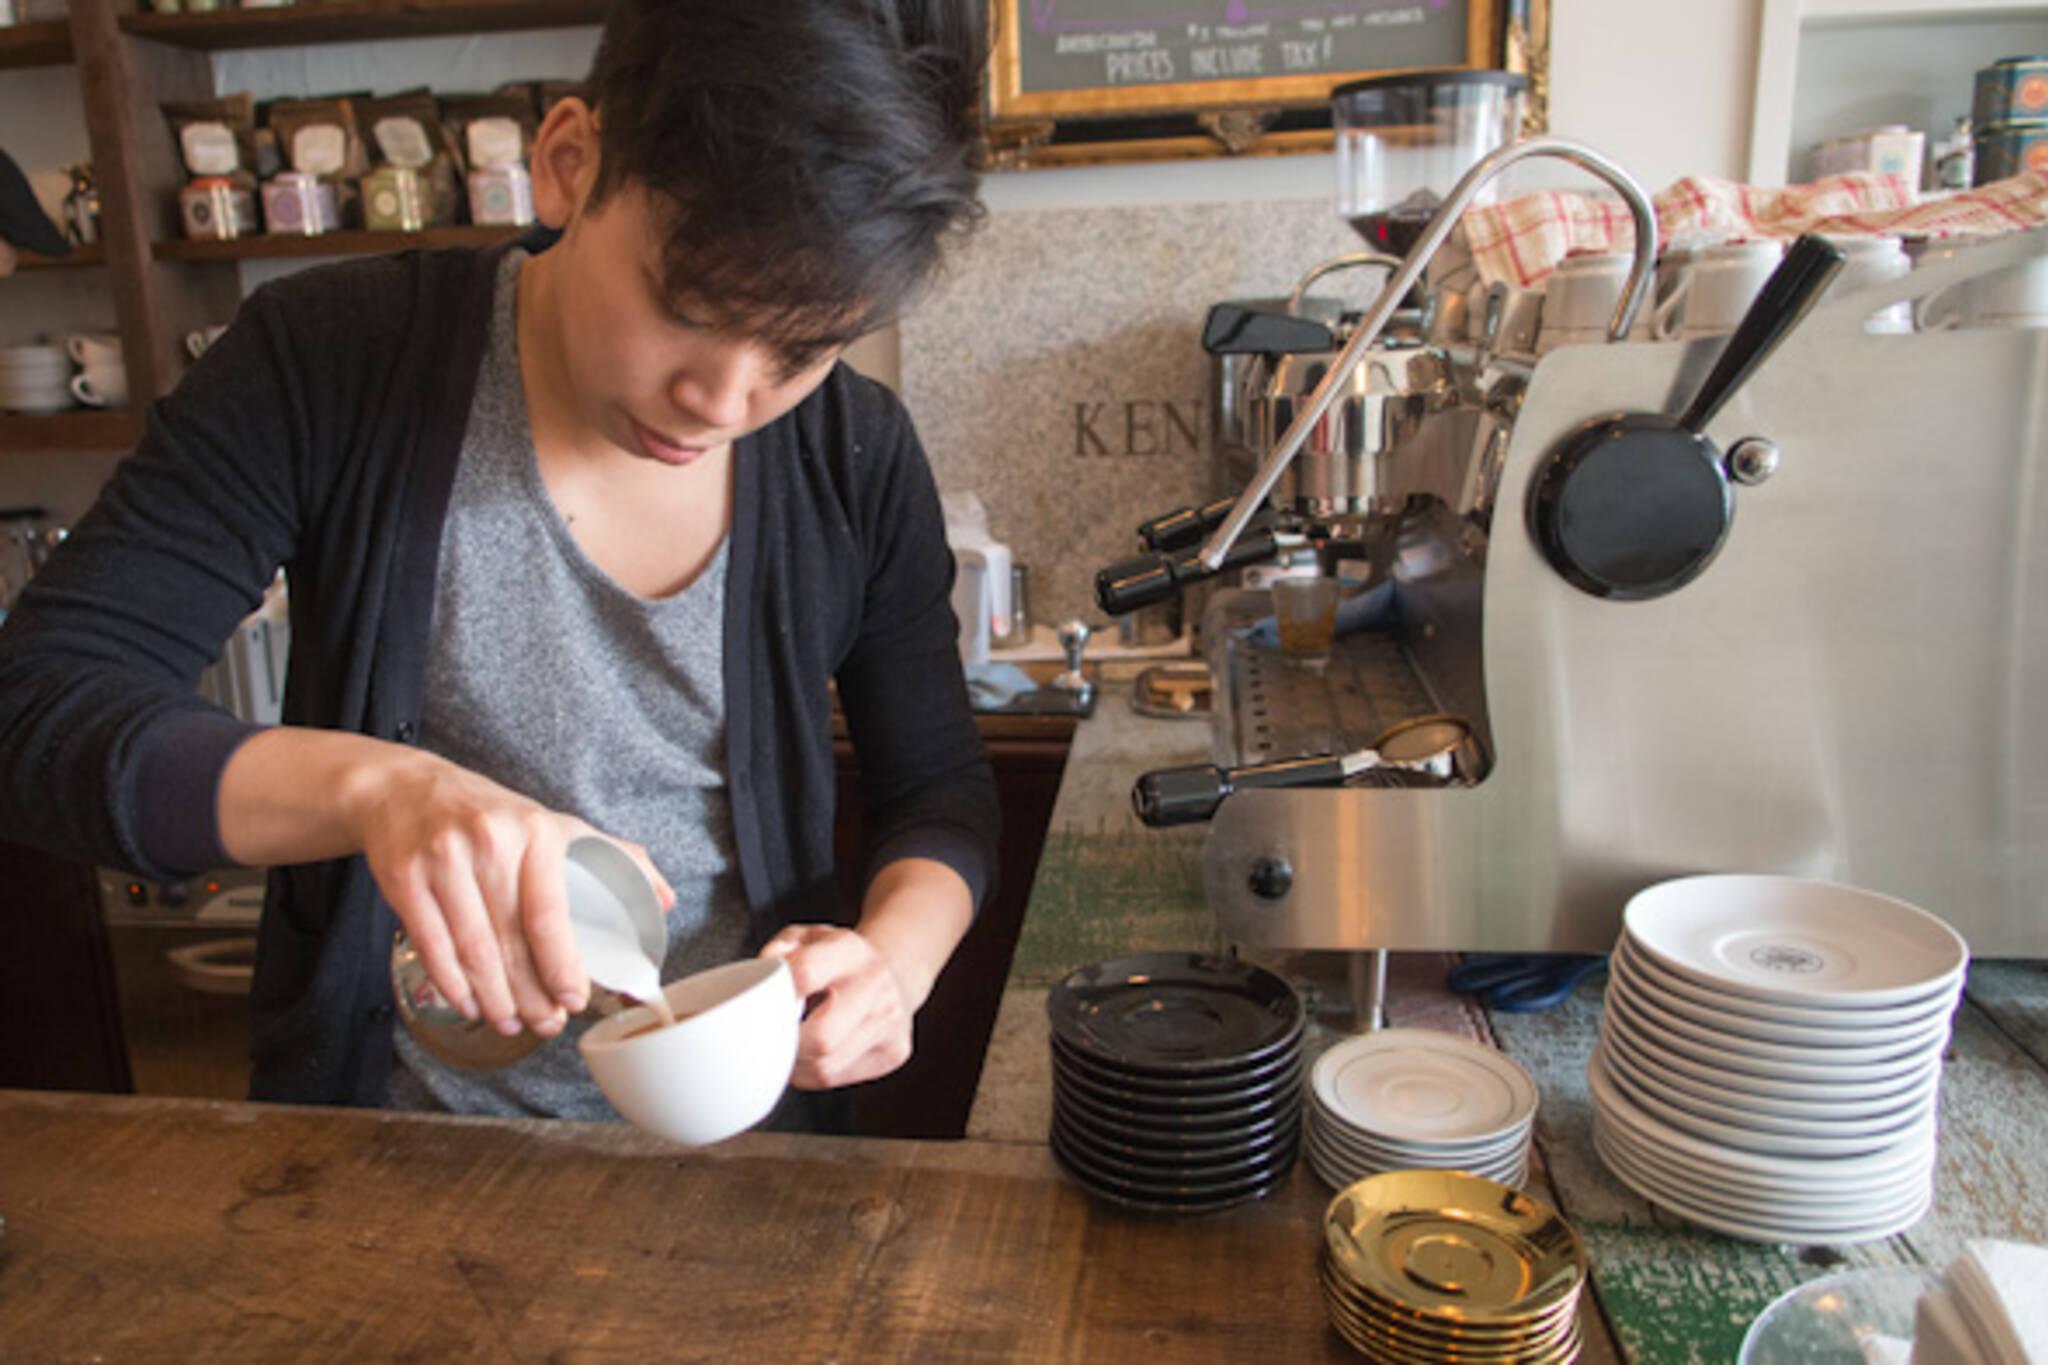 toronto best new cafes 2012